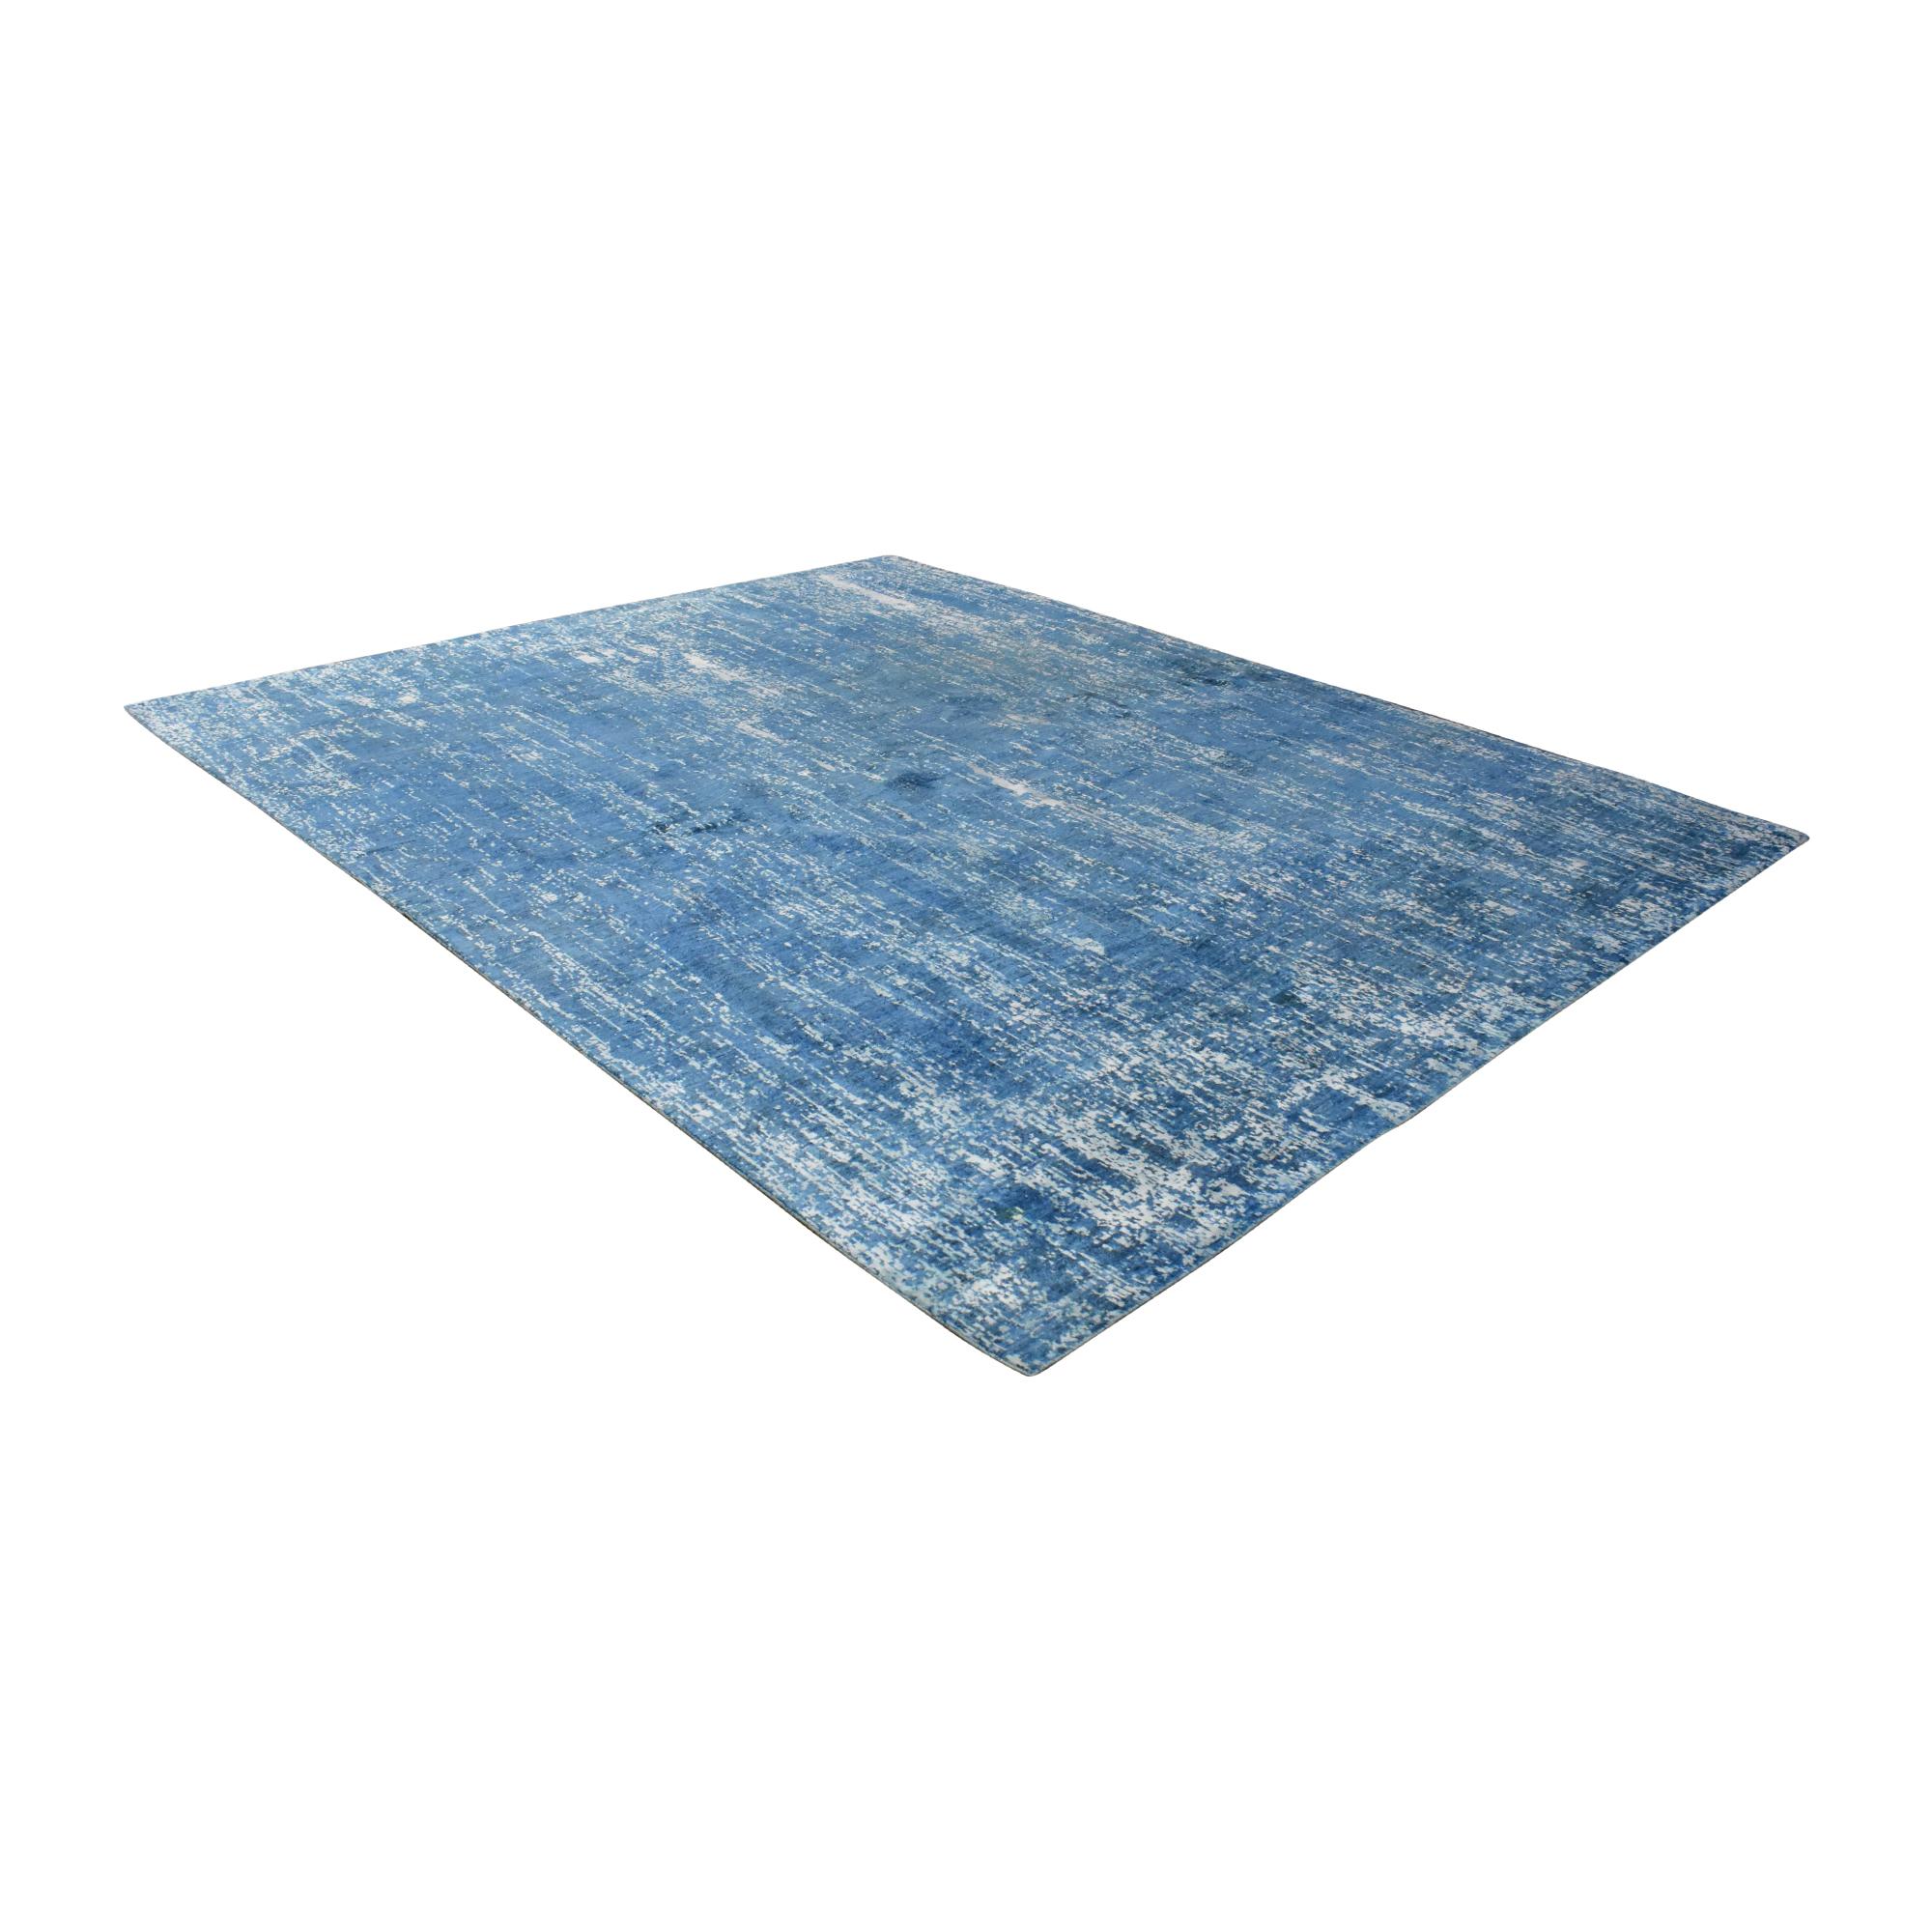 ABC Carpet & Home ABC Carpet & Home Modern Area Rug coupon